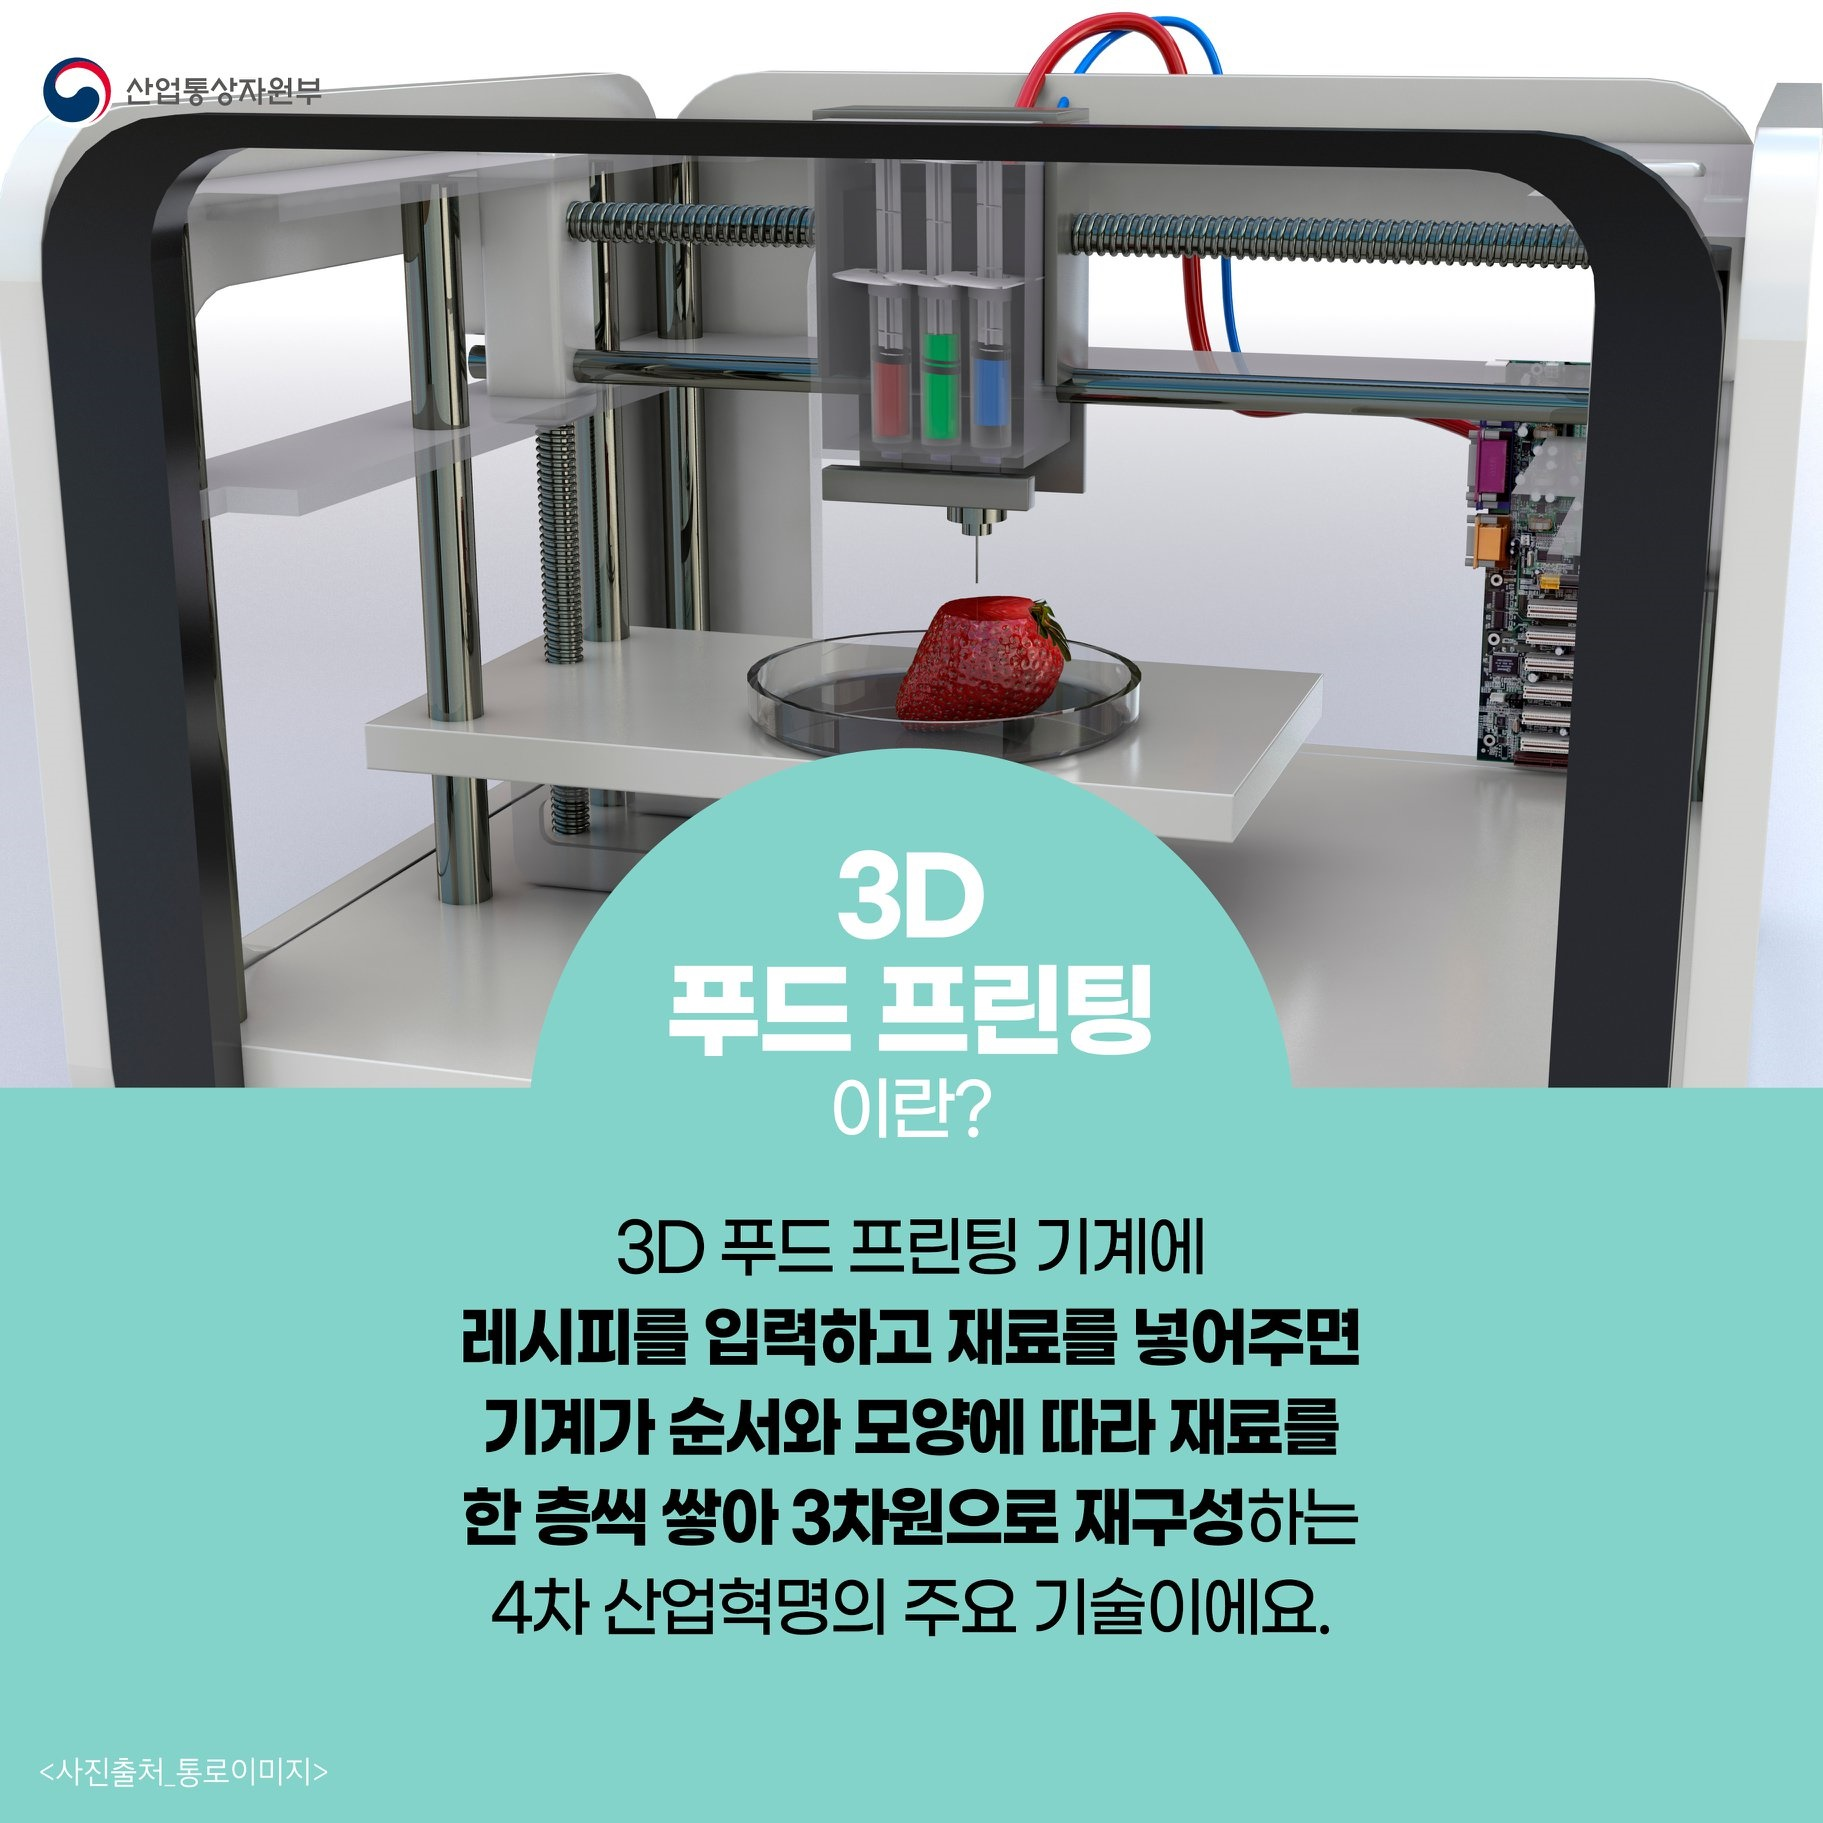 3D 프린터로 음식을 만든다고?